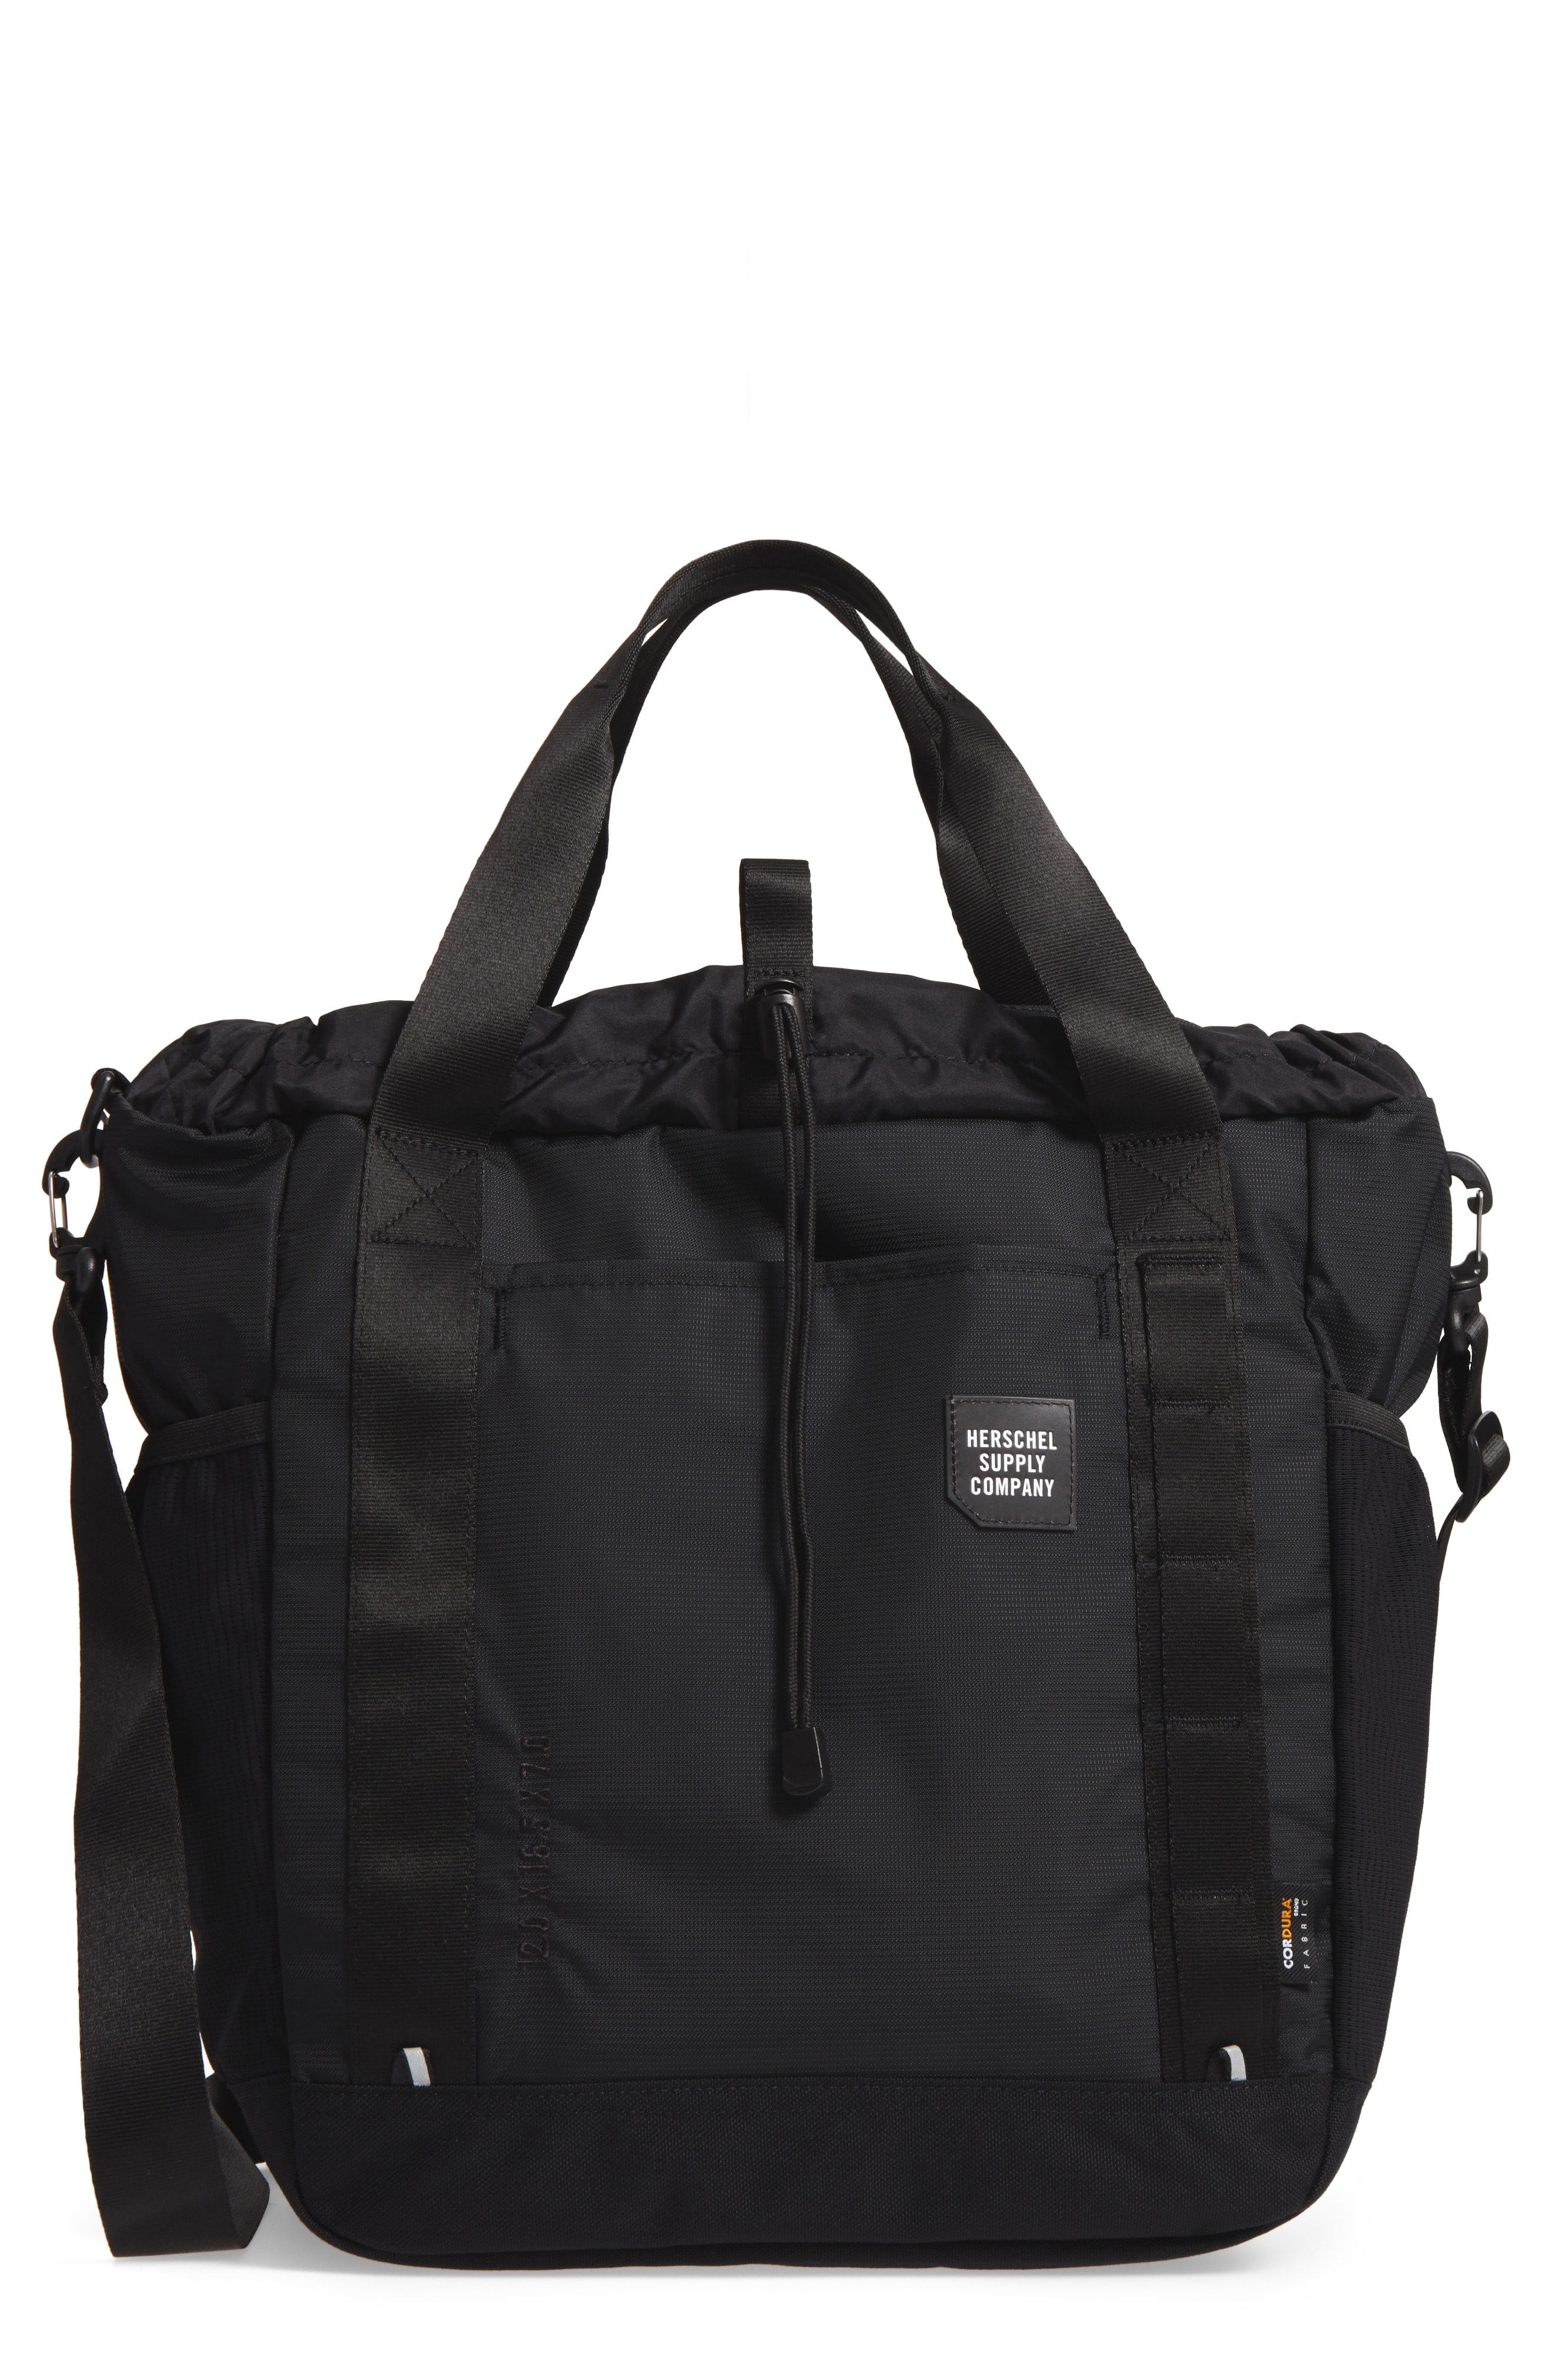 Reliable Yoga Mat Bag Waterproof Yoga Mat Bag Mesh Backpack Shoulder Messenger For Women Gym Bag Black Yoga Circle Shoes